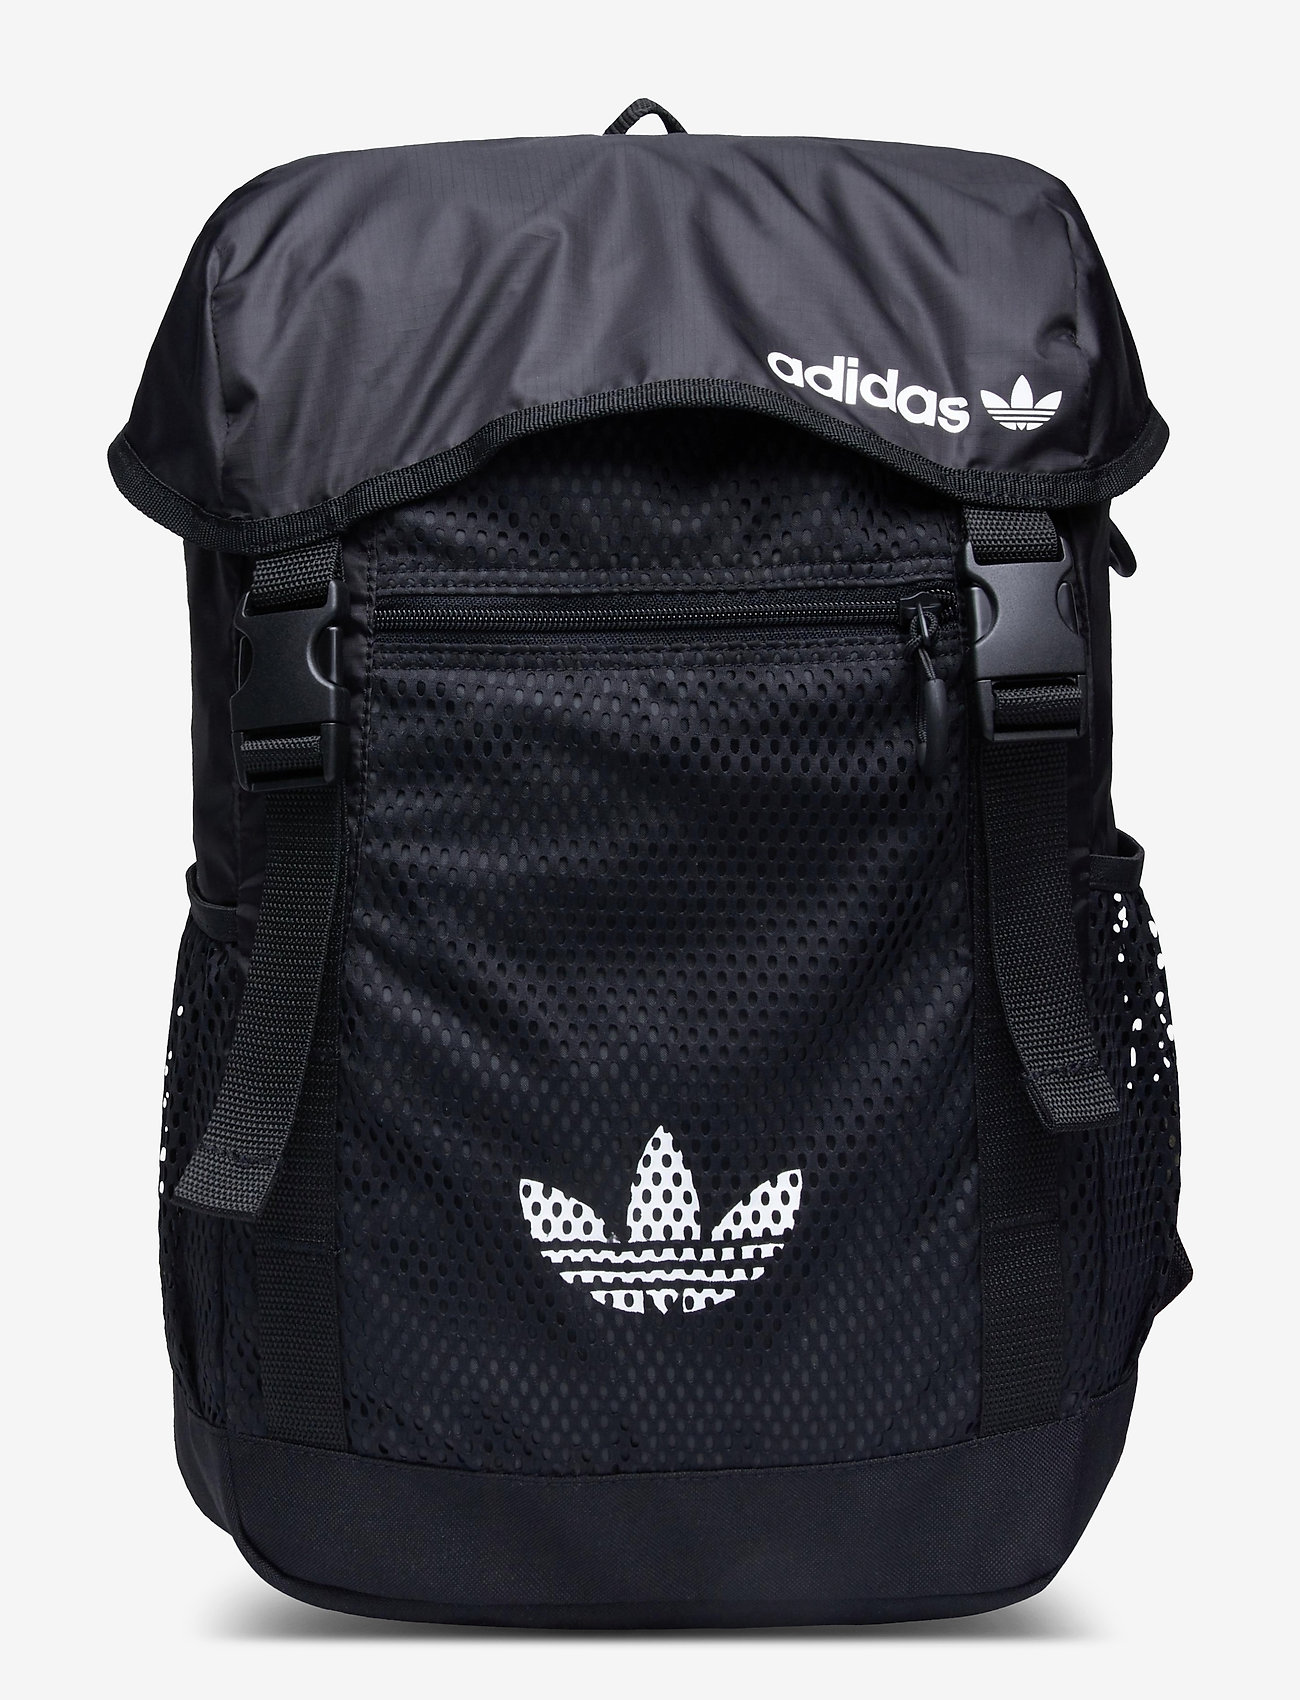 adidas Originals - ADV TOPLOADER S - treenikassit - black/white - 0